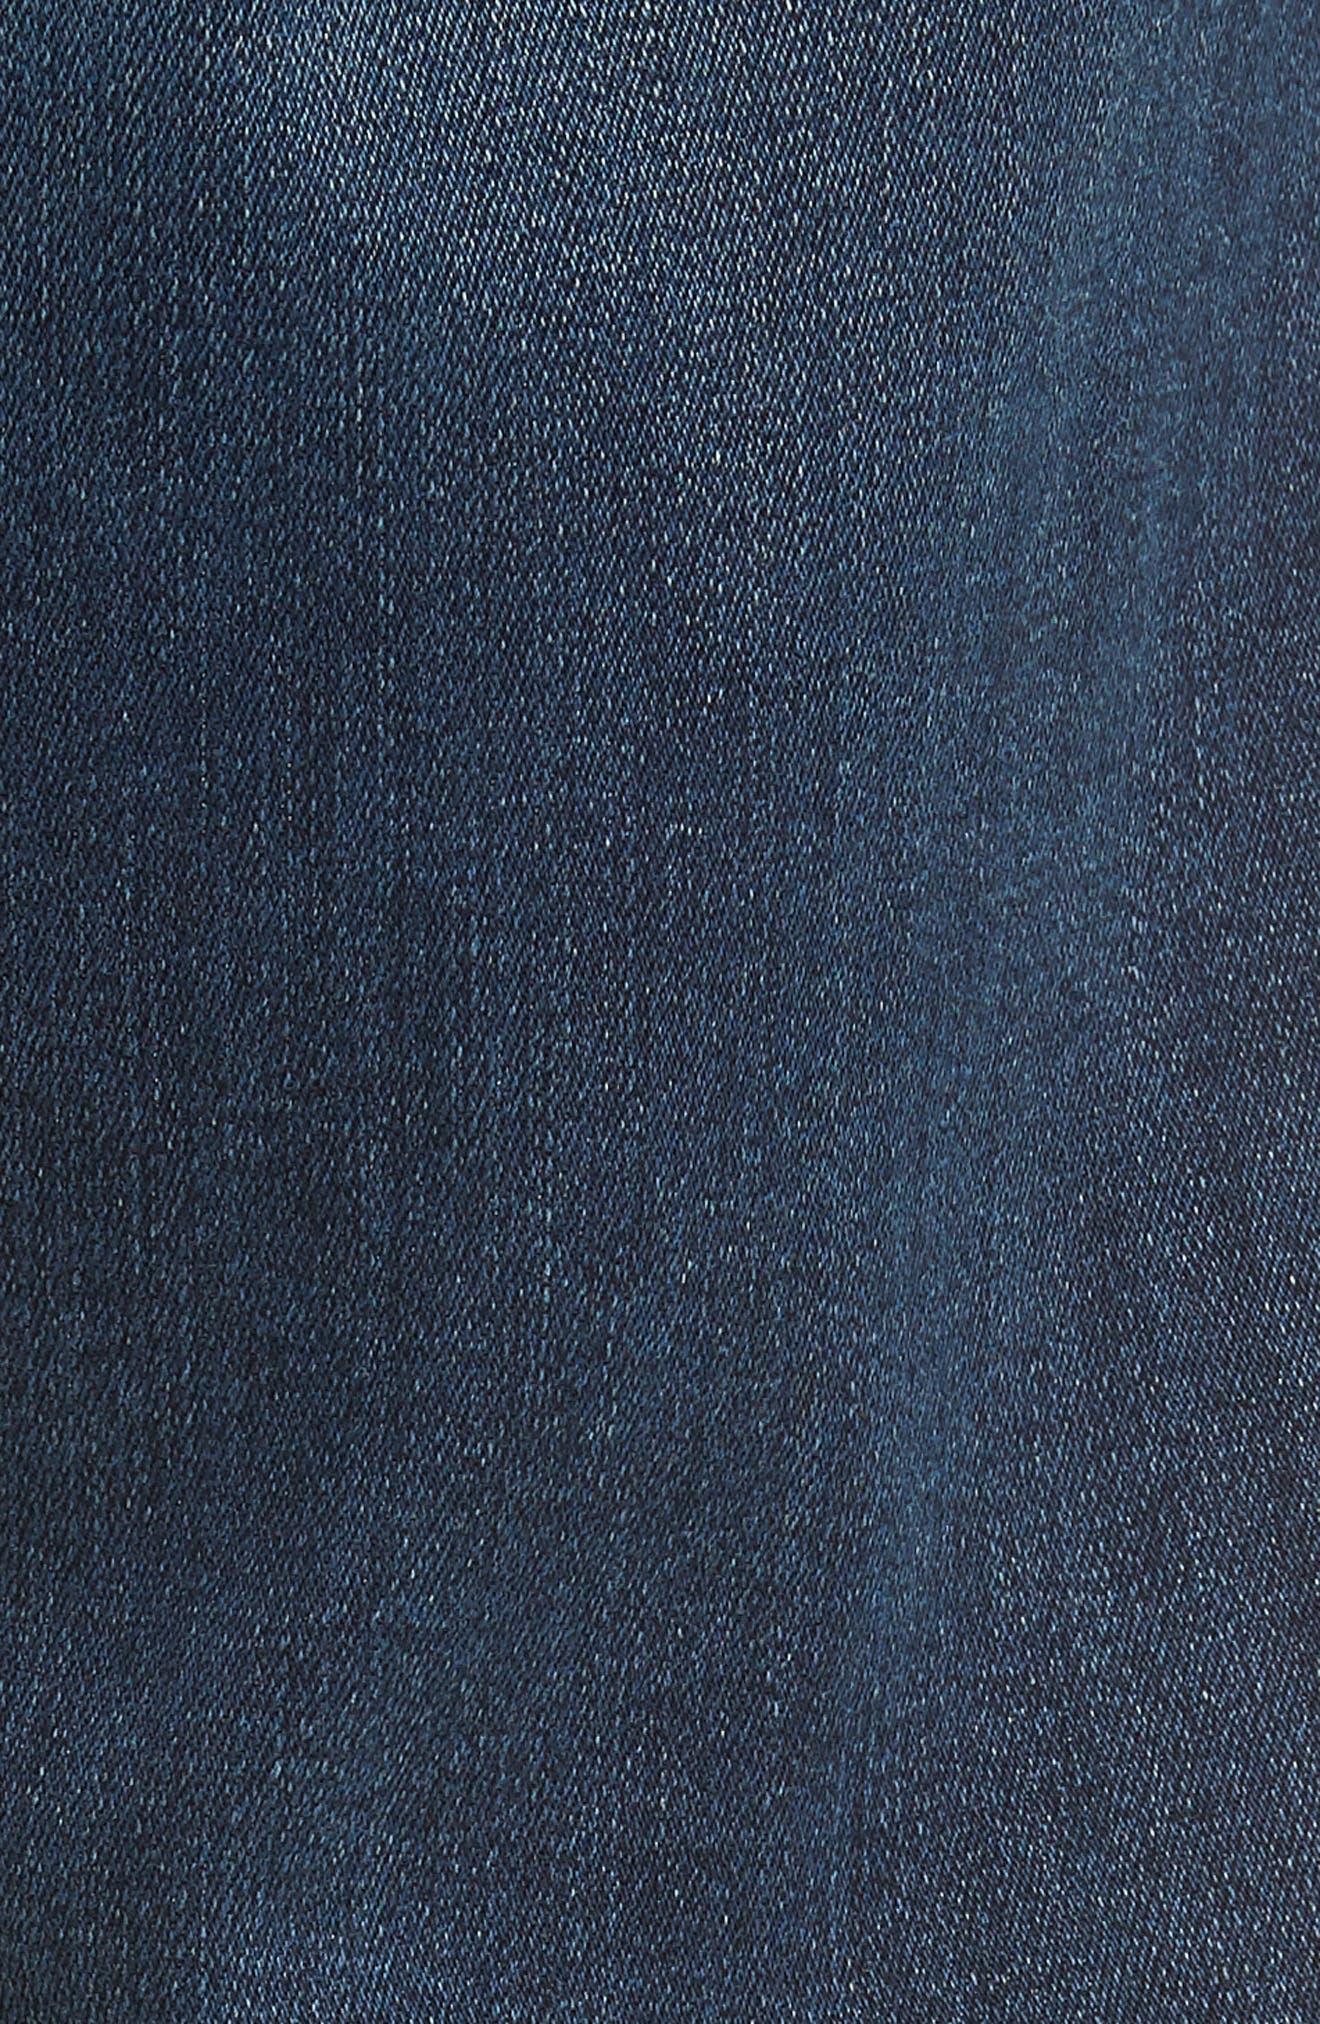 Jimmy Slim Straight Leg Jeans,                             Alternate thumbnail 5, color,                             ATLAS BLUE